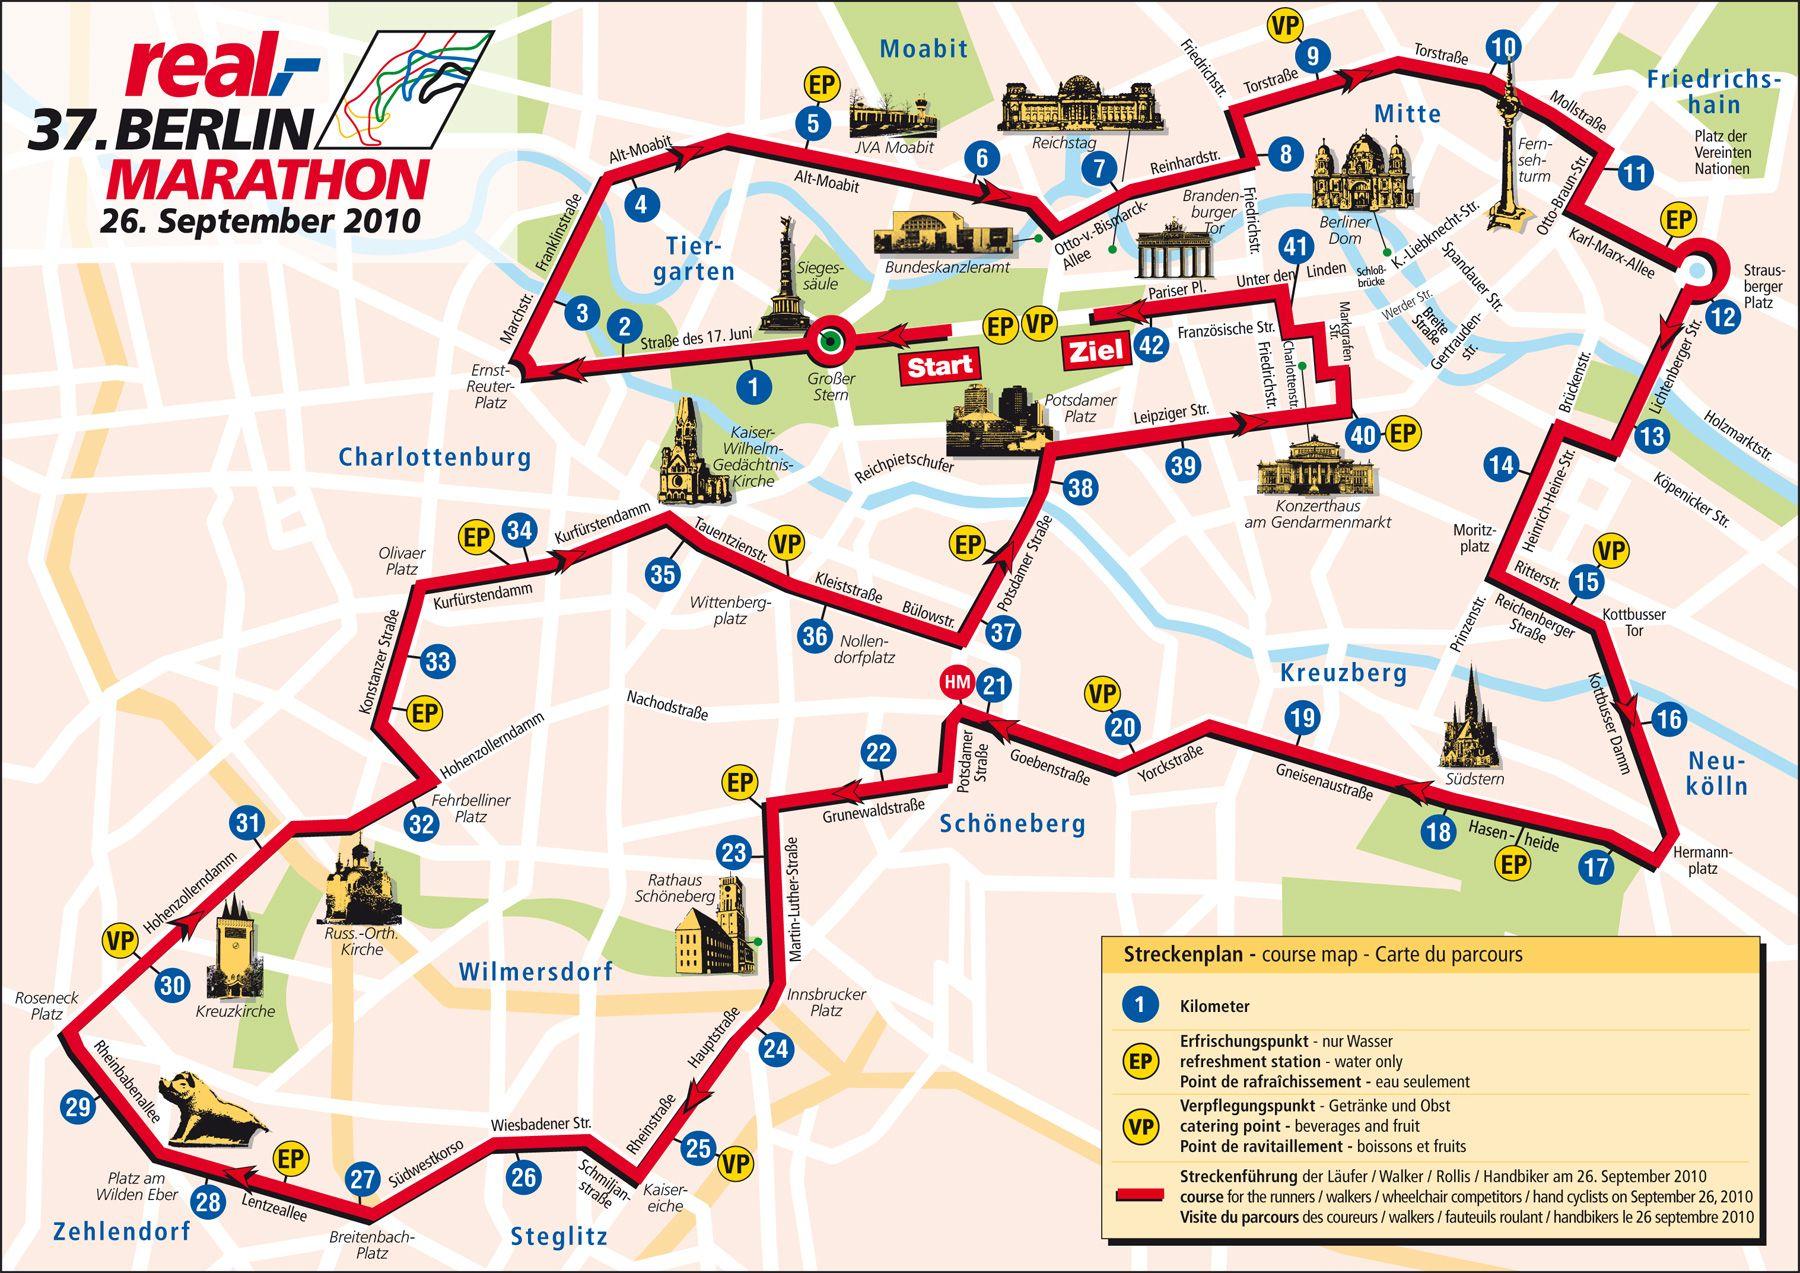 Best Images About Race Maps On Pinterest - Chicago marathon map